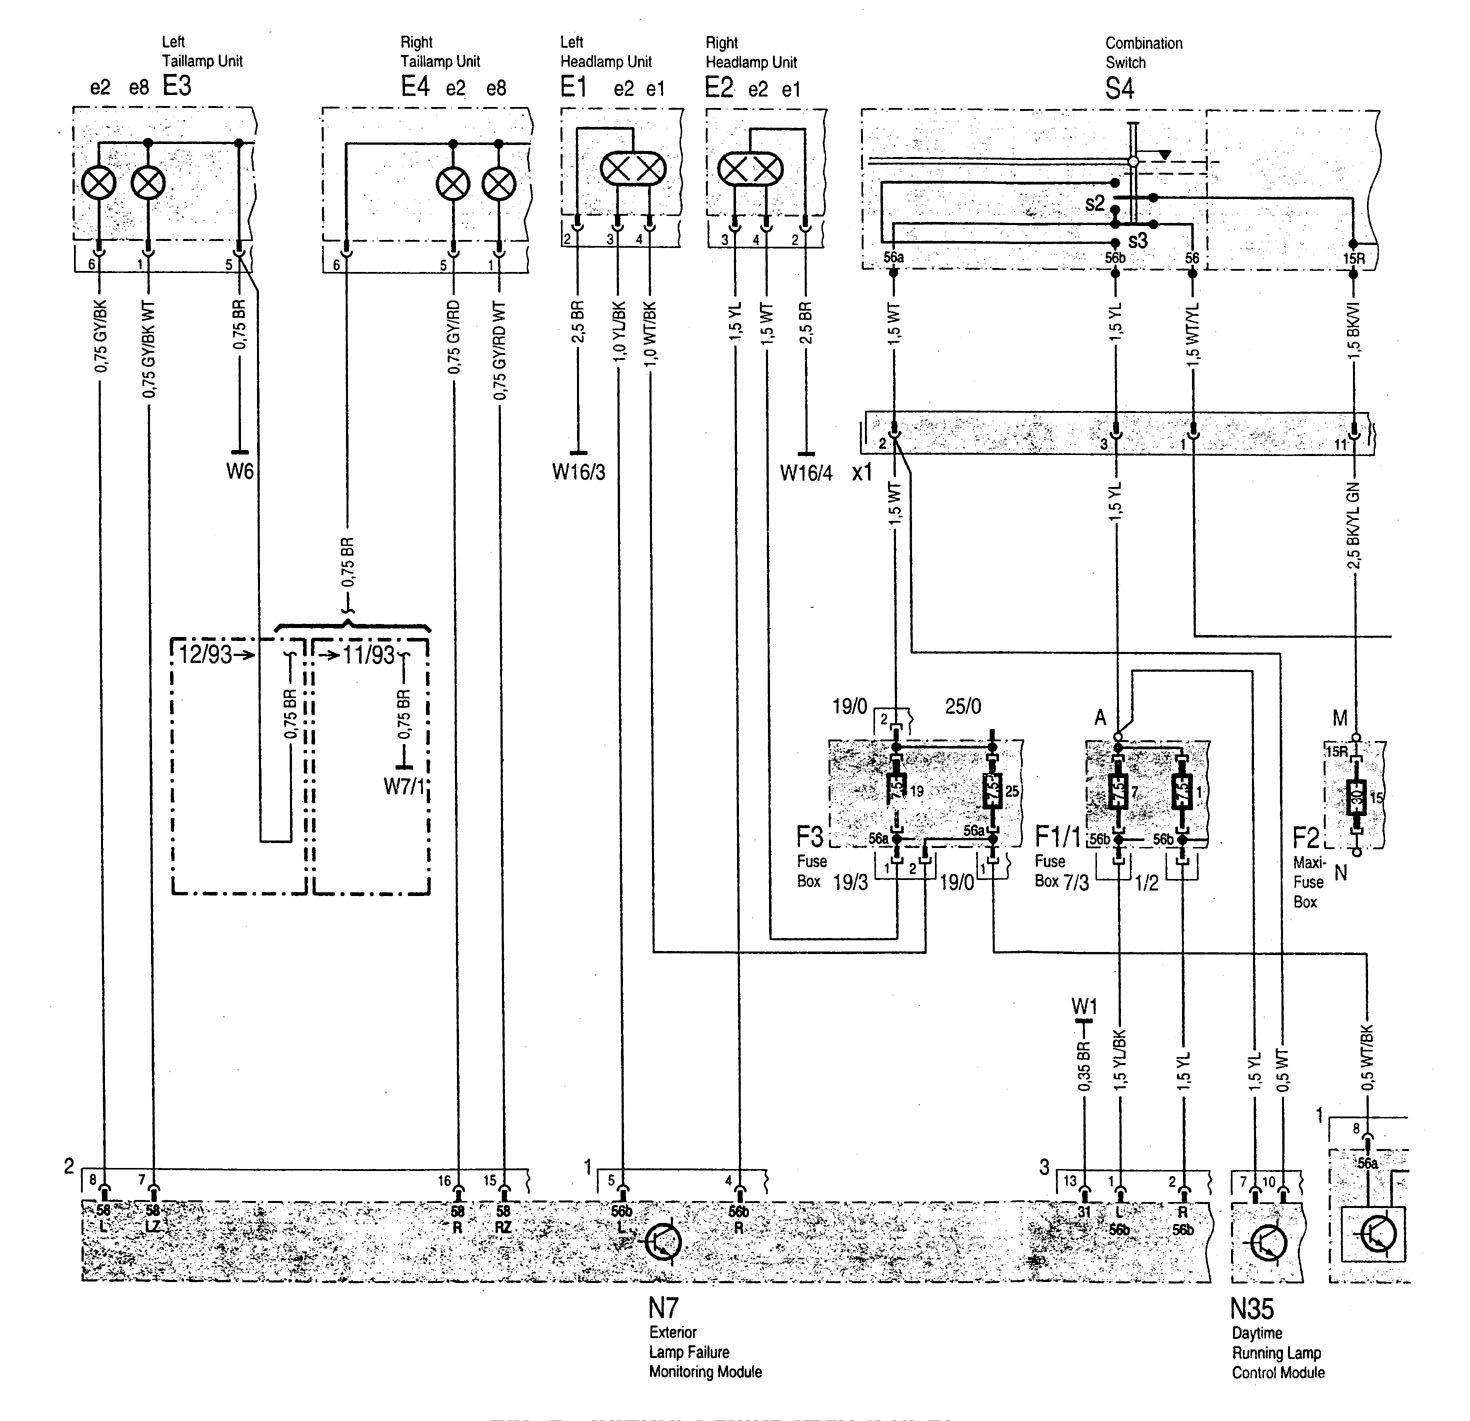 1999 Mercedes E320 Wiring Diagrams Toggle Switch Wiring Diagram Free Download Landrovers Yenpancane Jeanjaures37 Fr